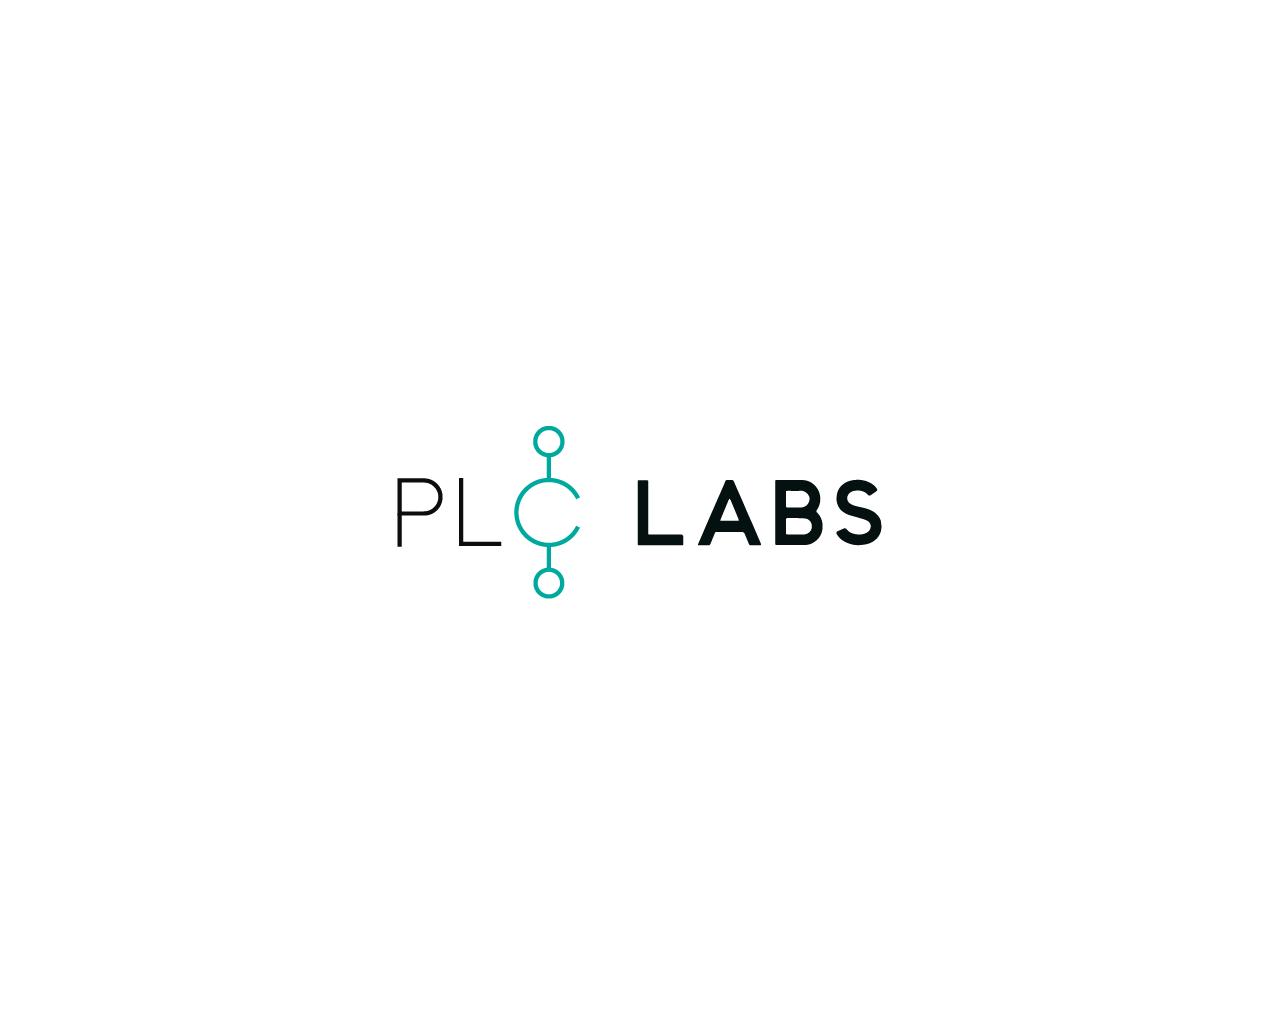 plc-presentation-02.png